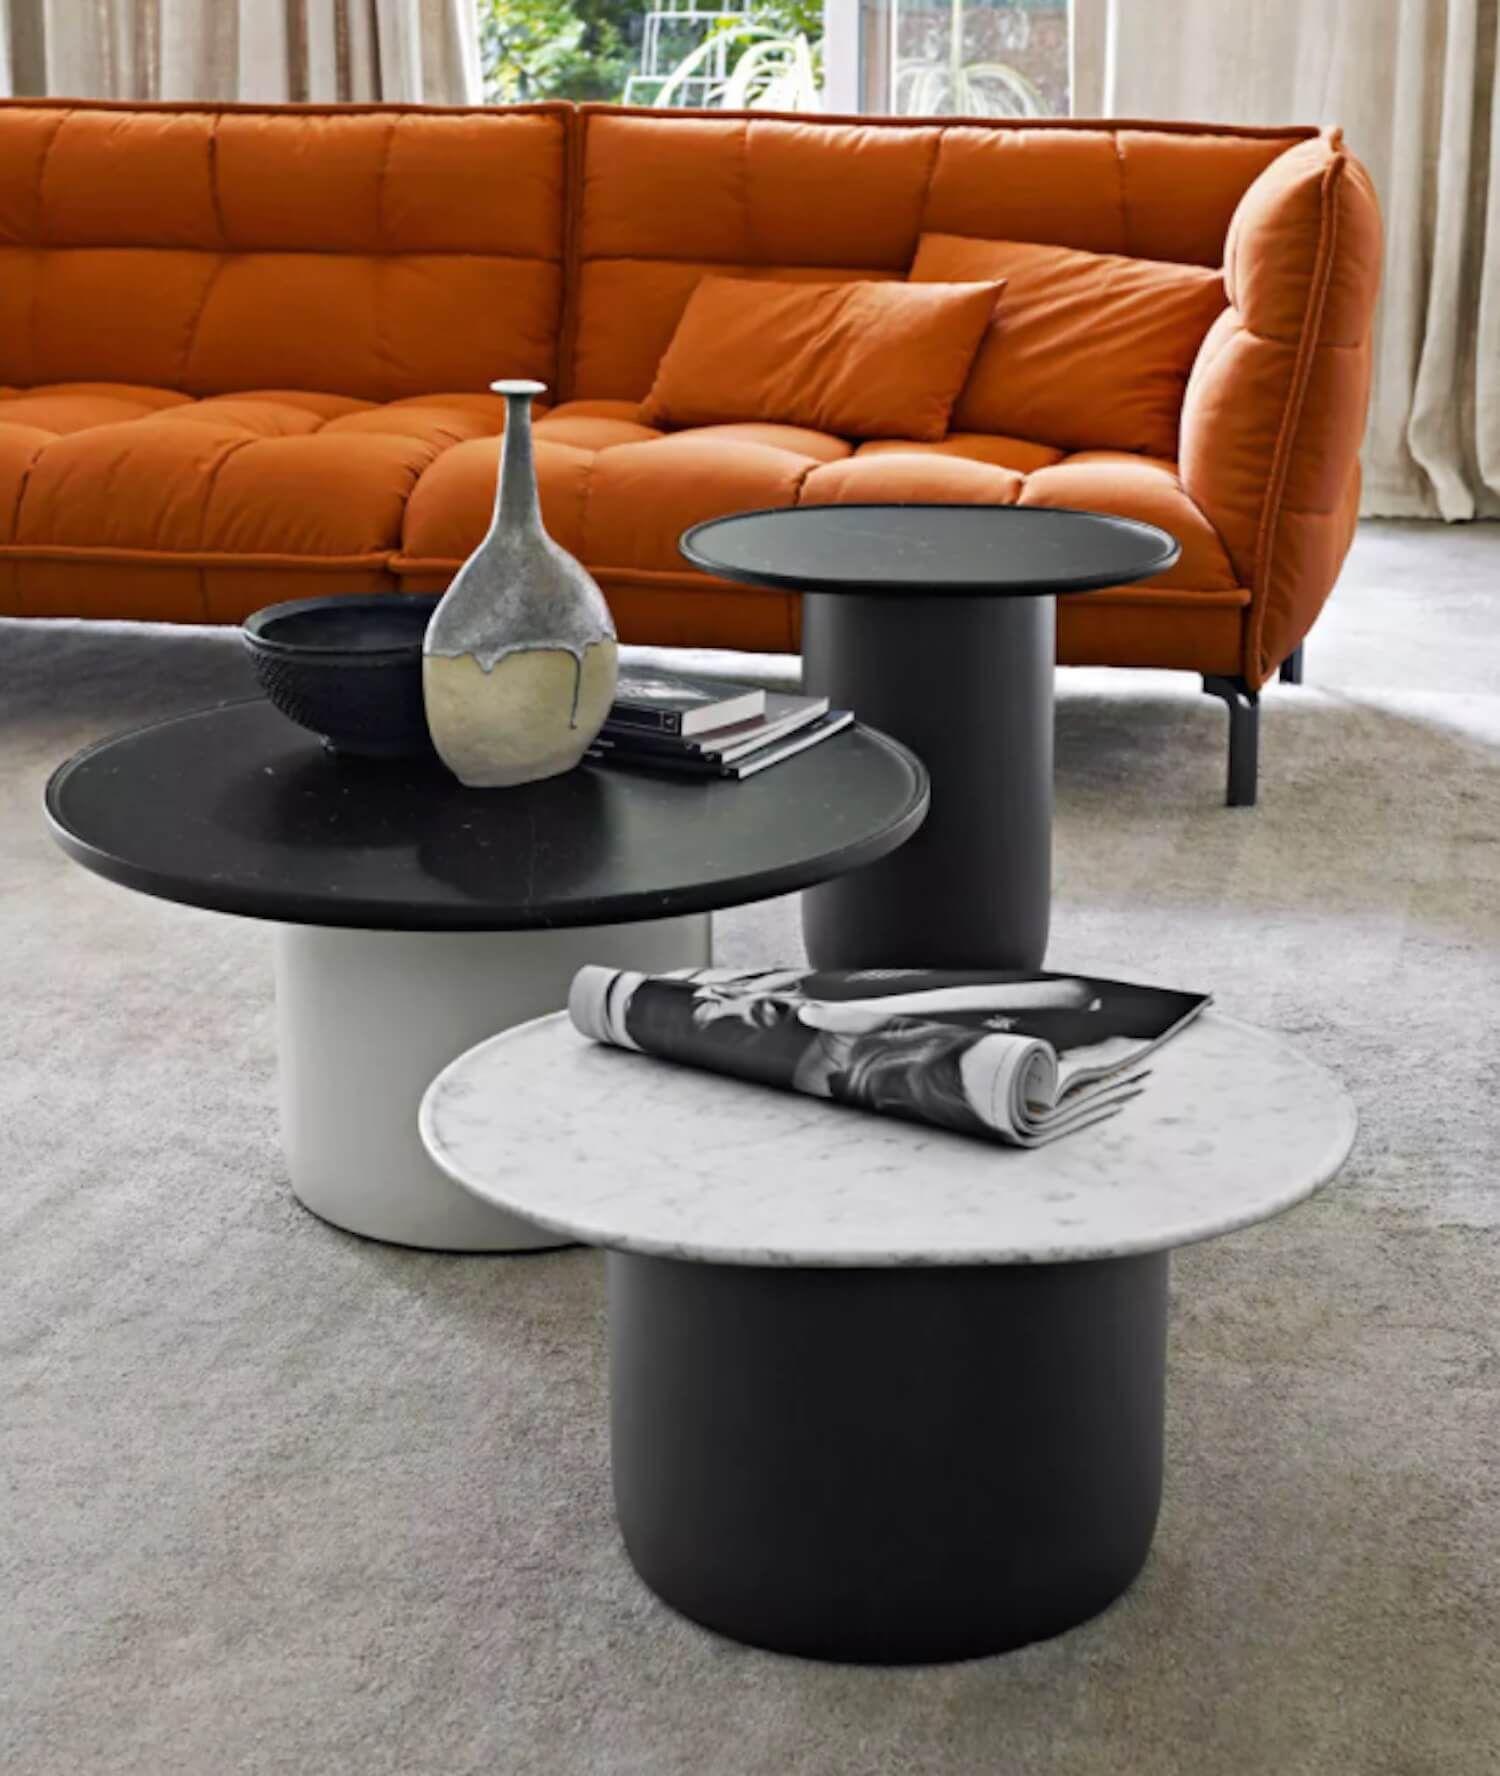 Muebles Hoover San Cristobal - Artist Andrea Sullivan S Interior Style F U R N I T U R E [mjhdah]https://image.isu.pub/151125154138-4a7cee3272bfa7b57b158f0da3e19735/jpg/page_1.jpg